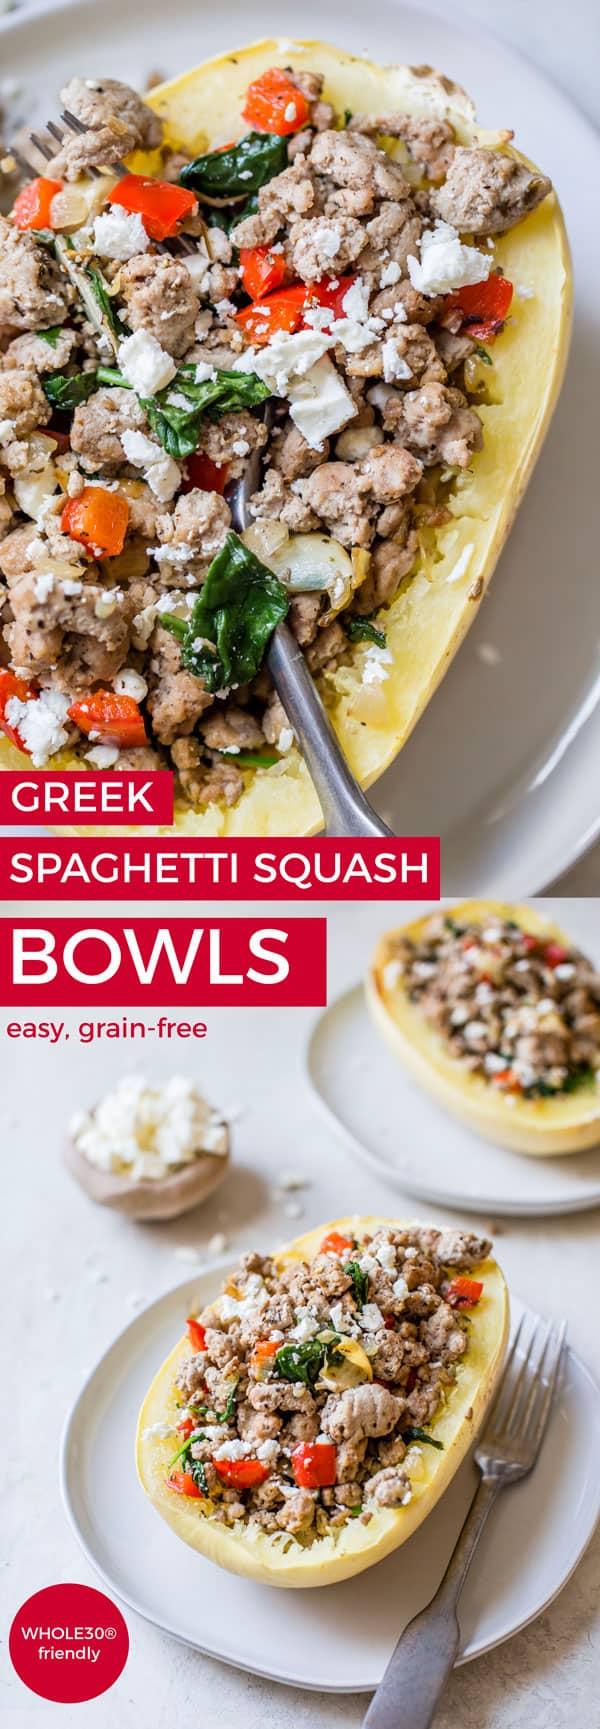 greek spaghetti squash bowls pin